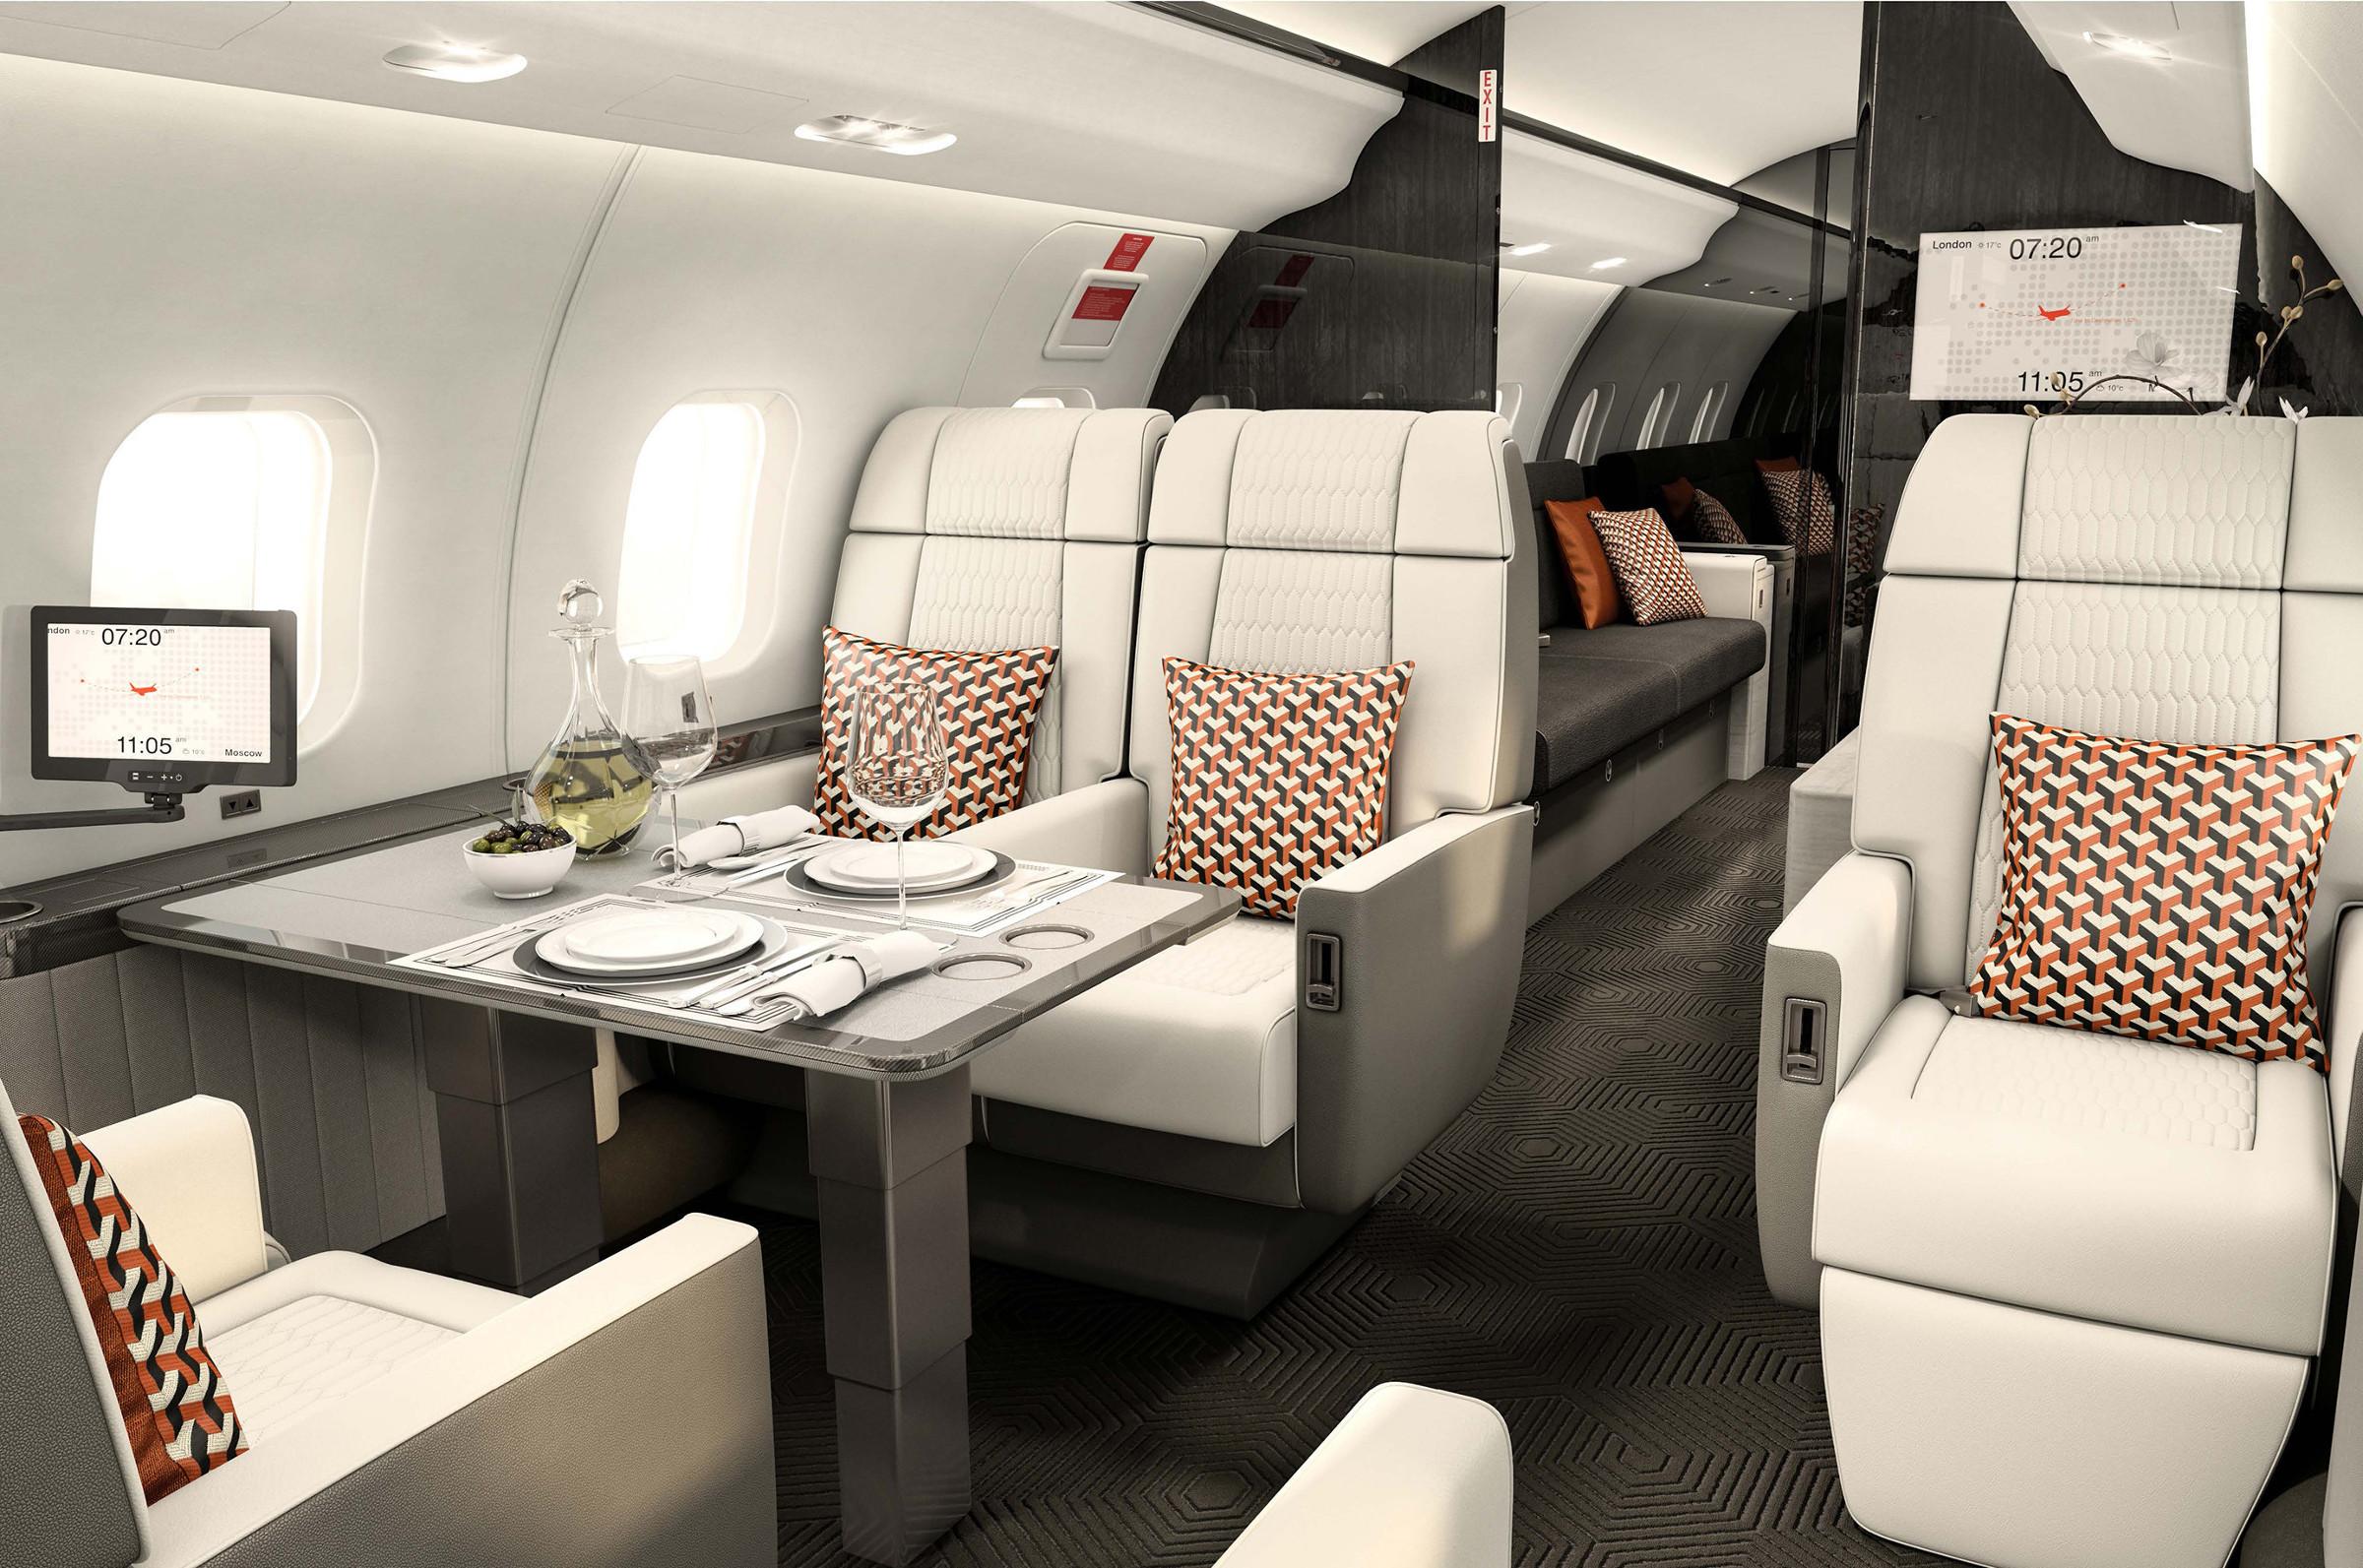 Fai Selects Collins Aerospace S Venue For A Significant